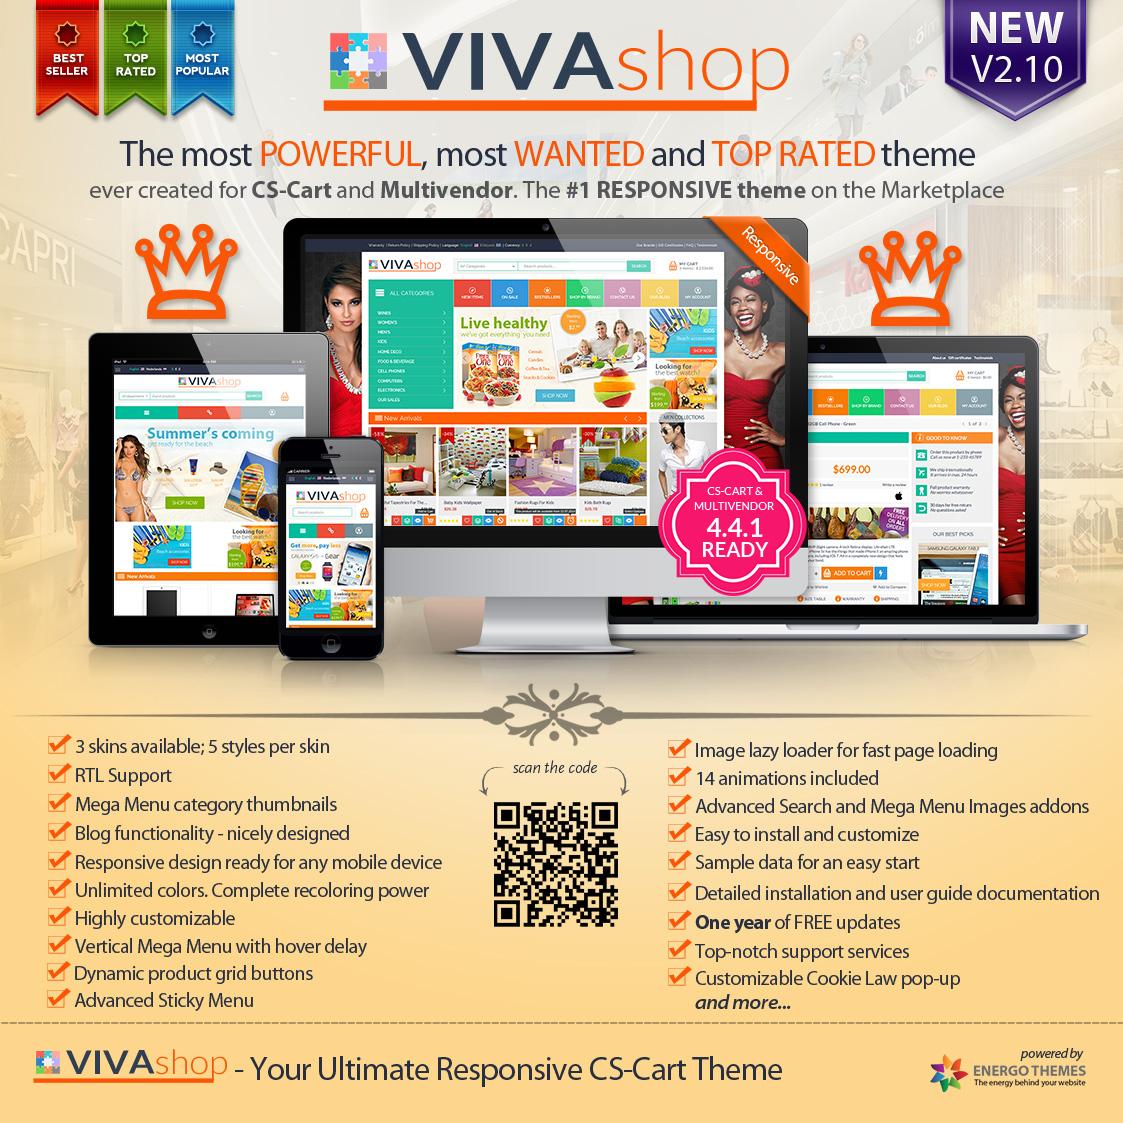 VIVAshop-V2.10-presentation-page-MP.jpg